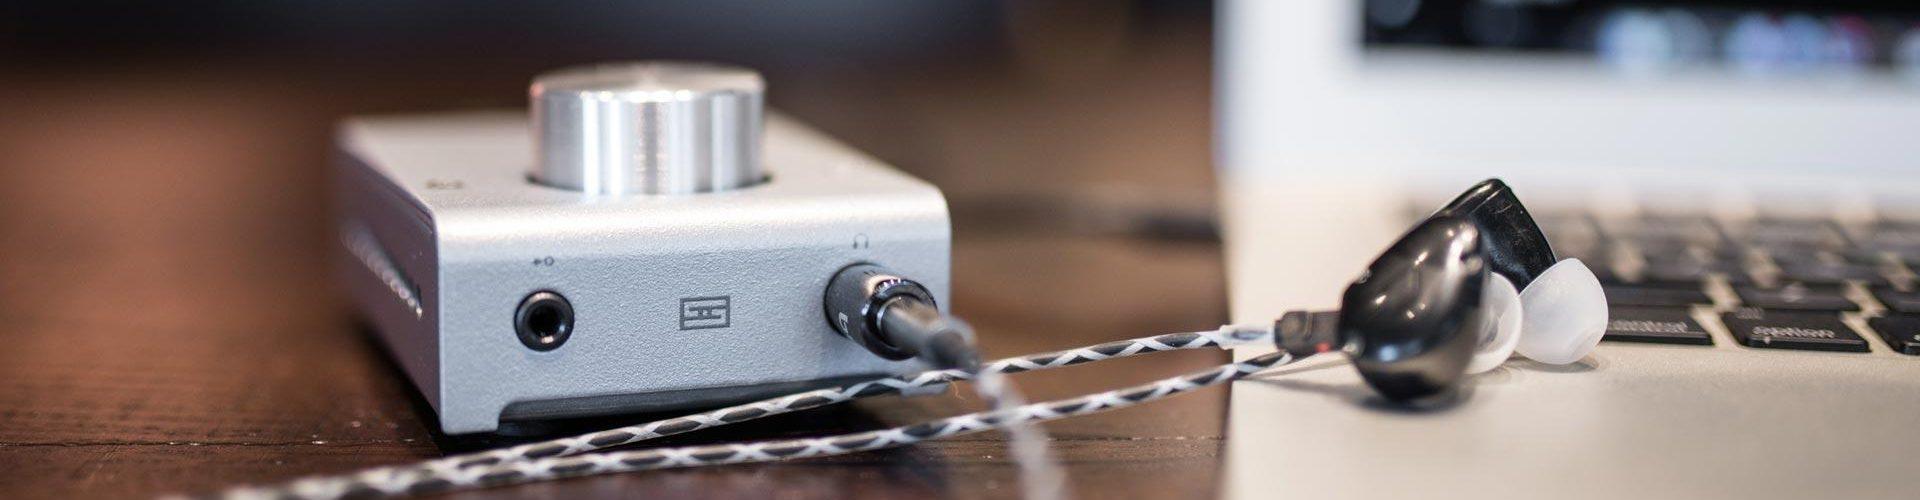 Schiit Fulla 2 Review - AudioStance